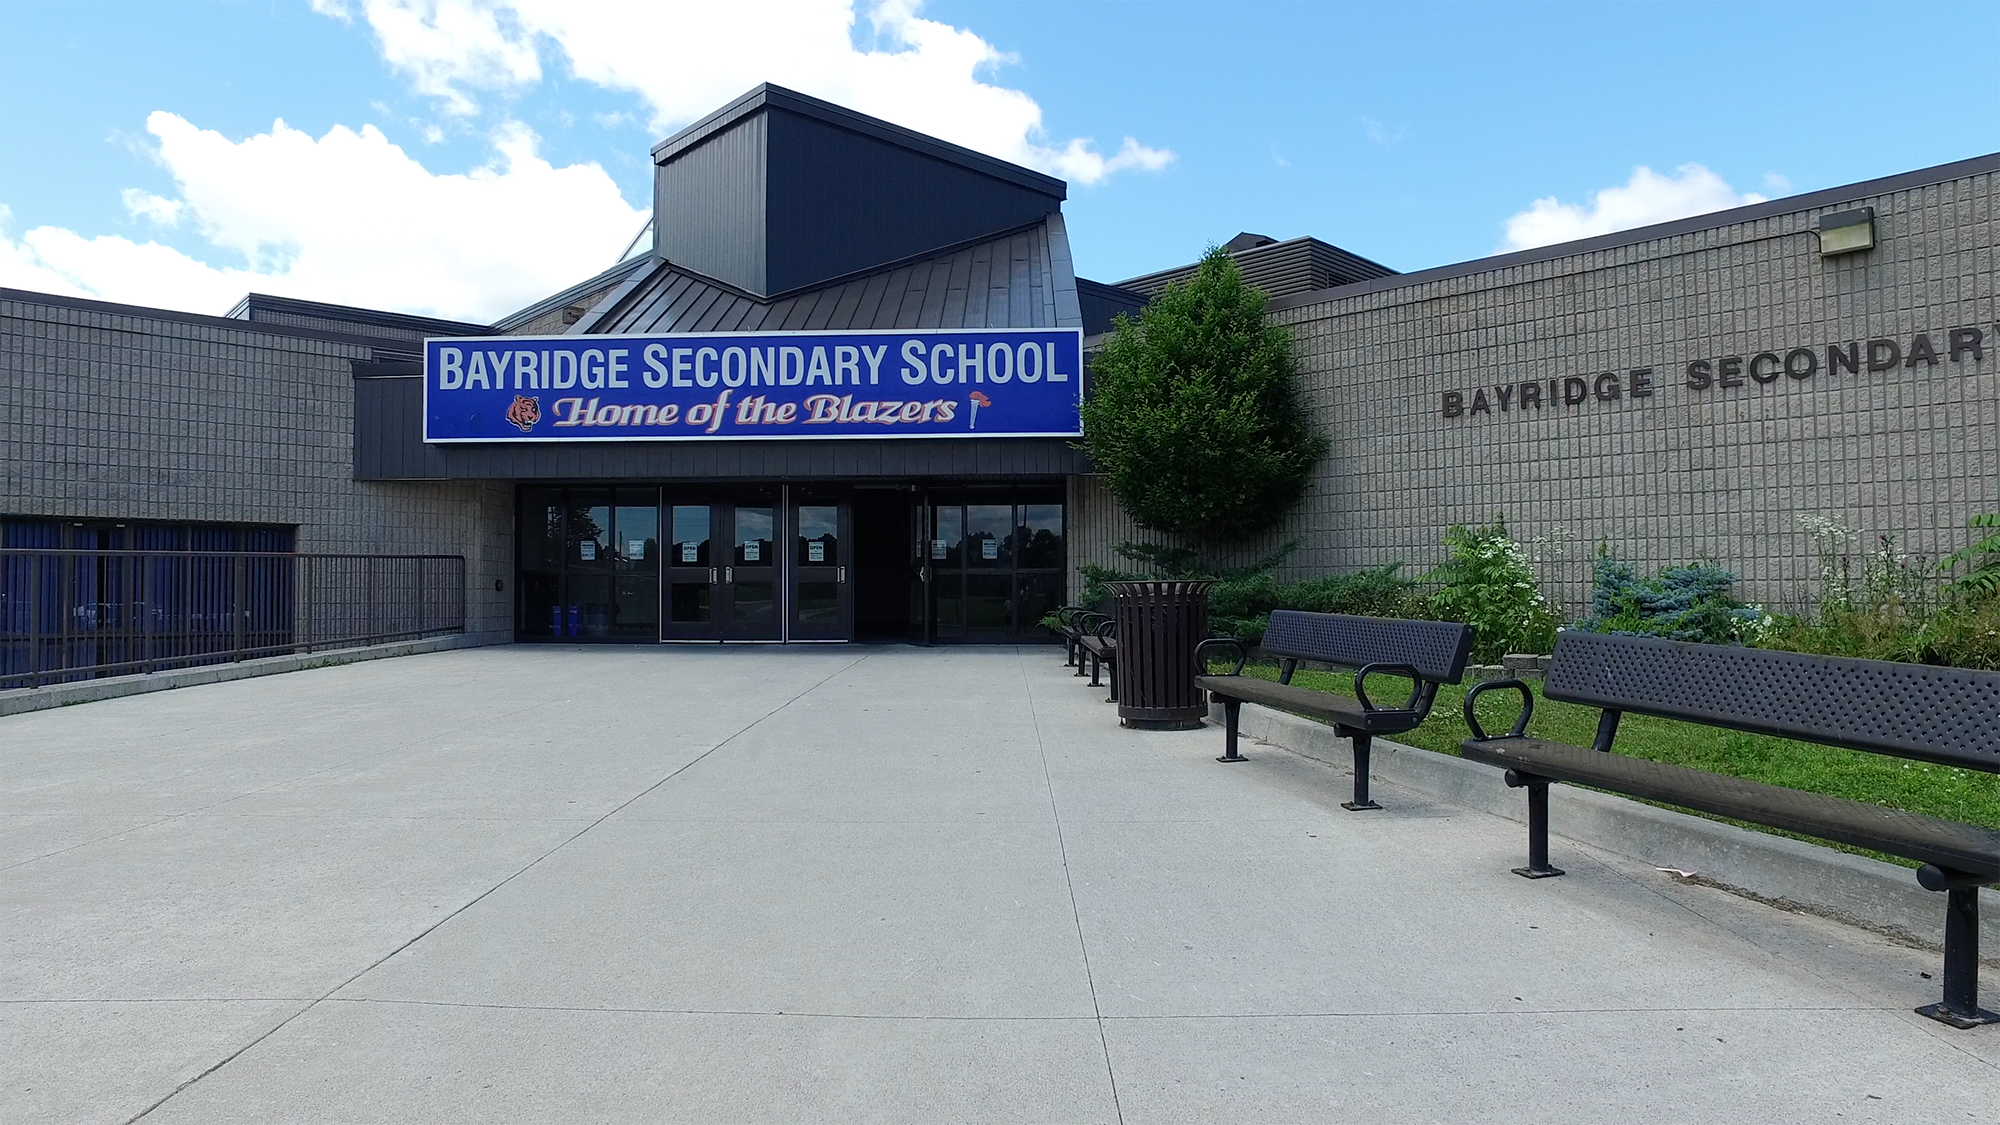 BAYRIDGE - SECONDARY SCHOOL